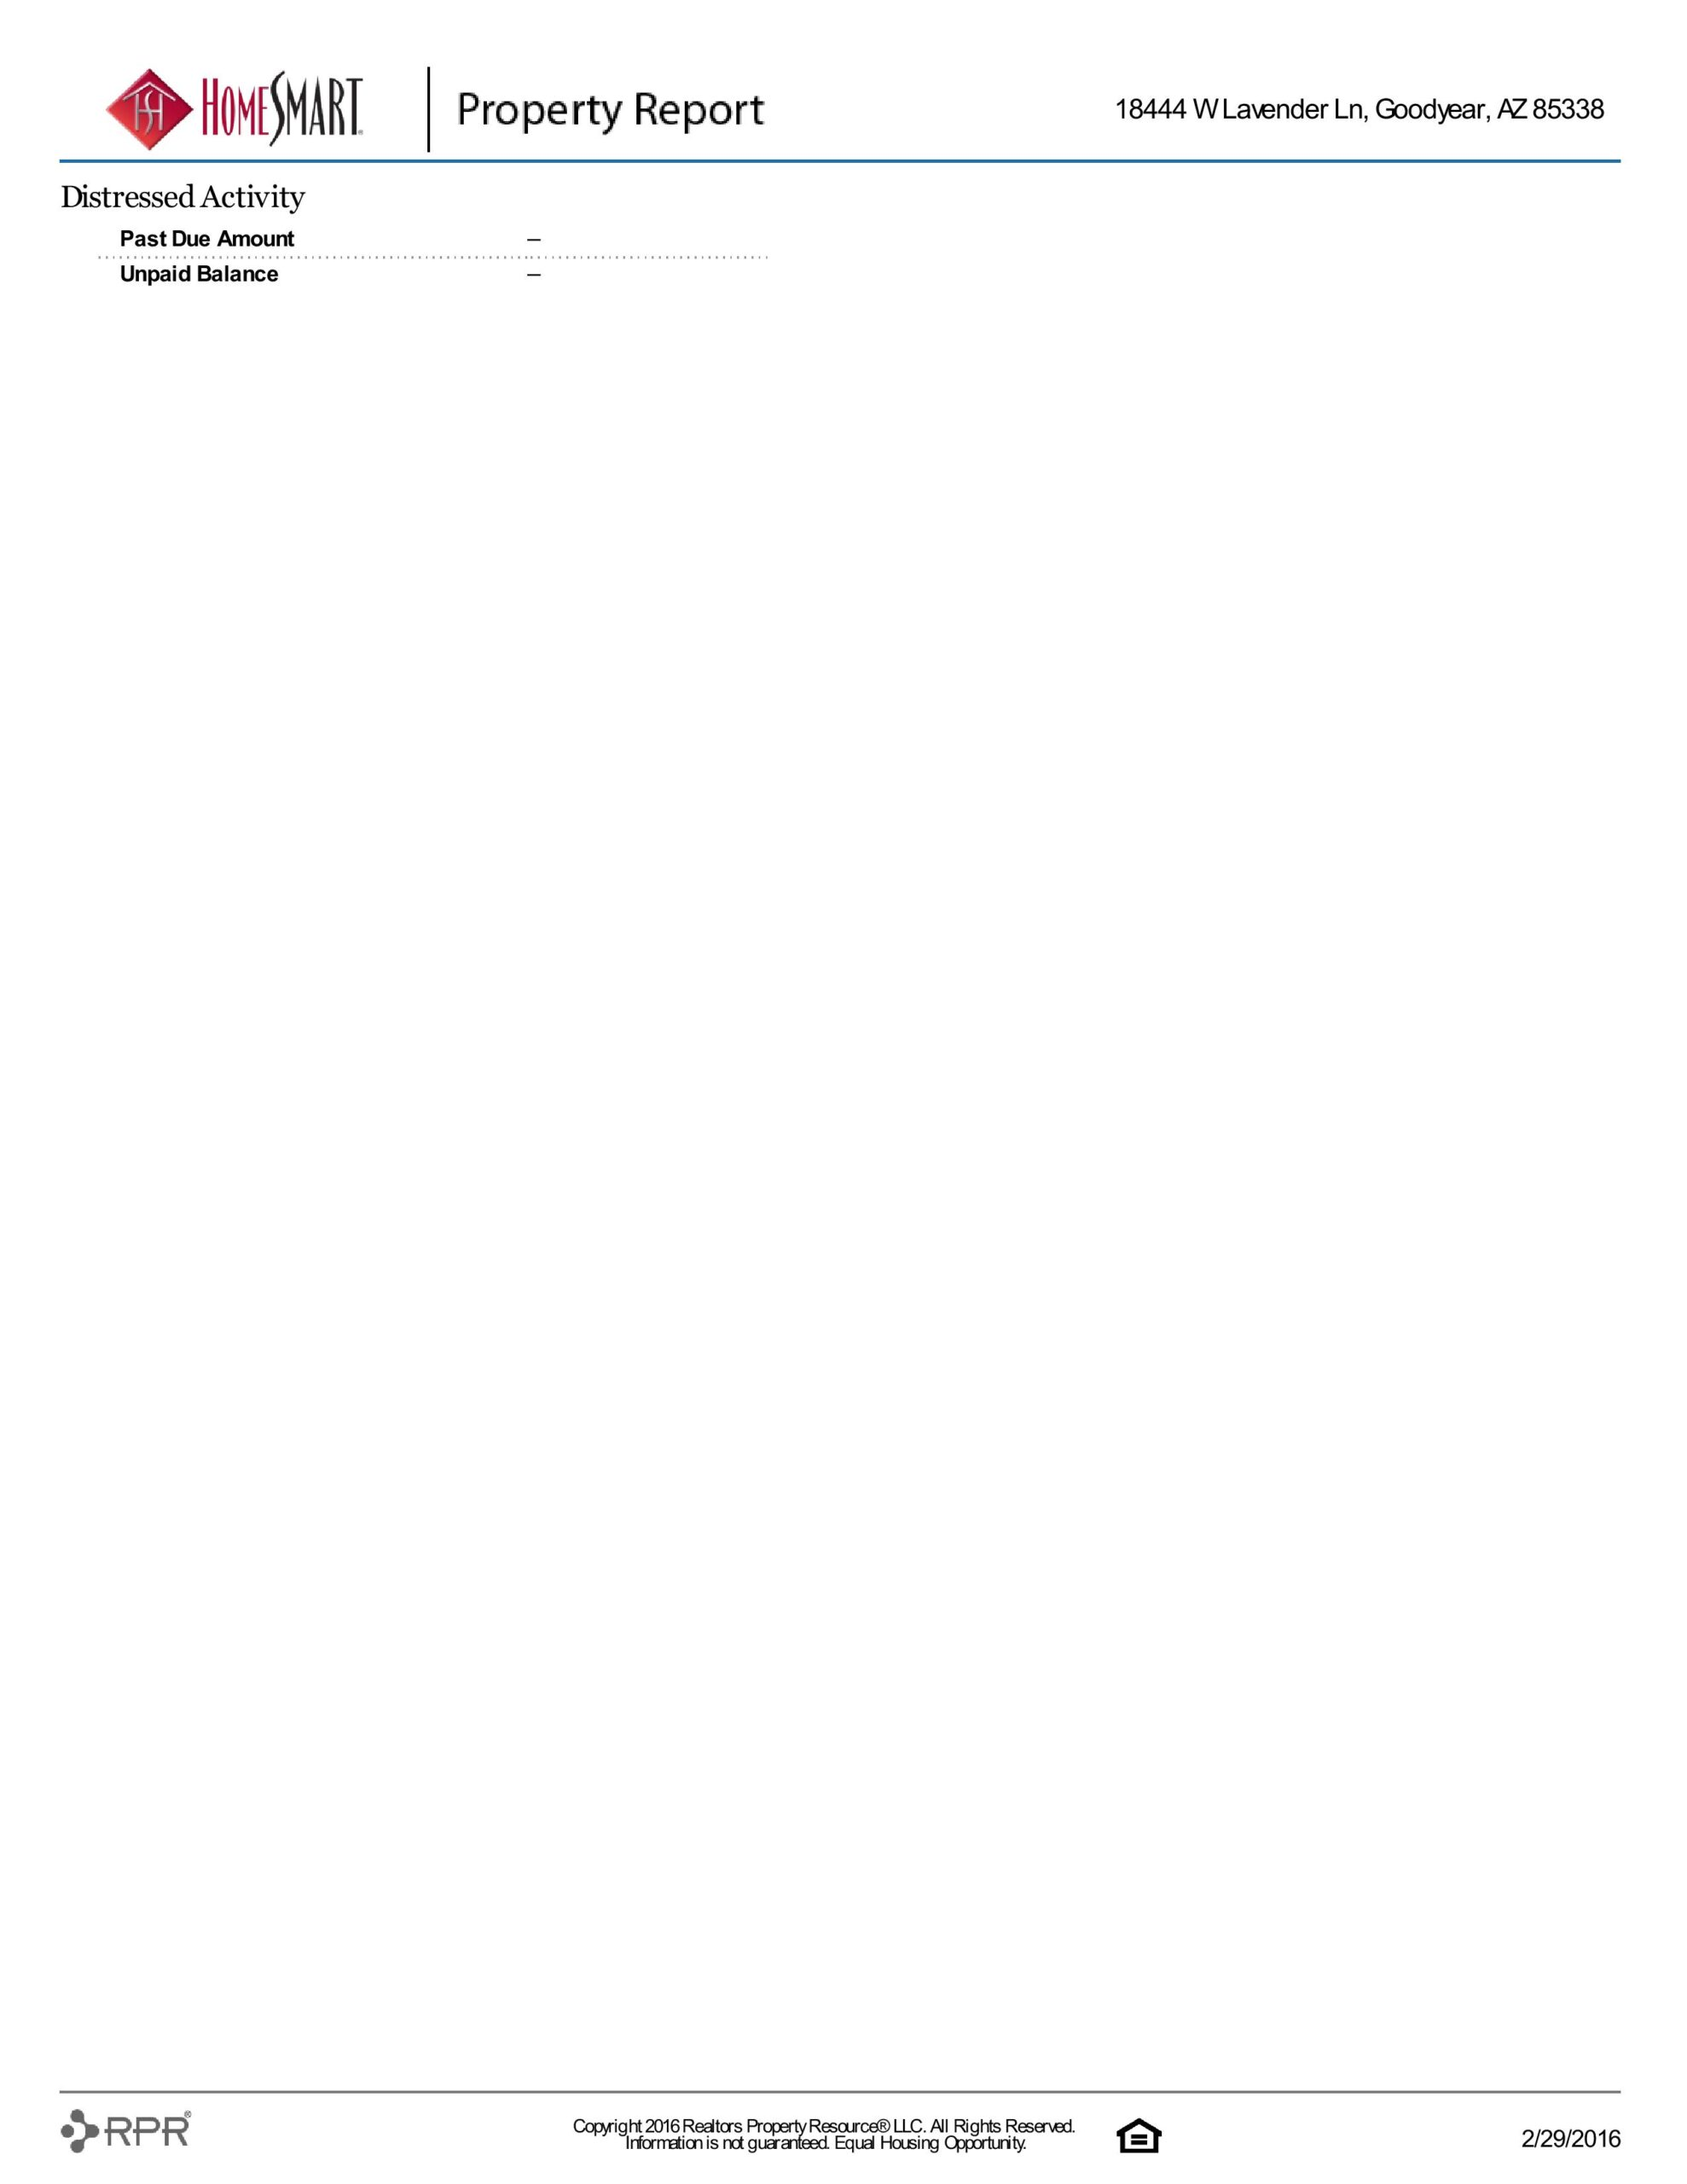 18444 W LAVENDER LN PROPERTY REPORT-page-013